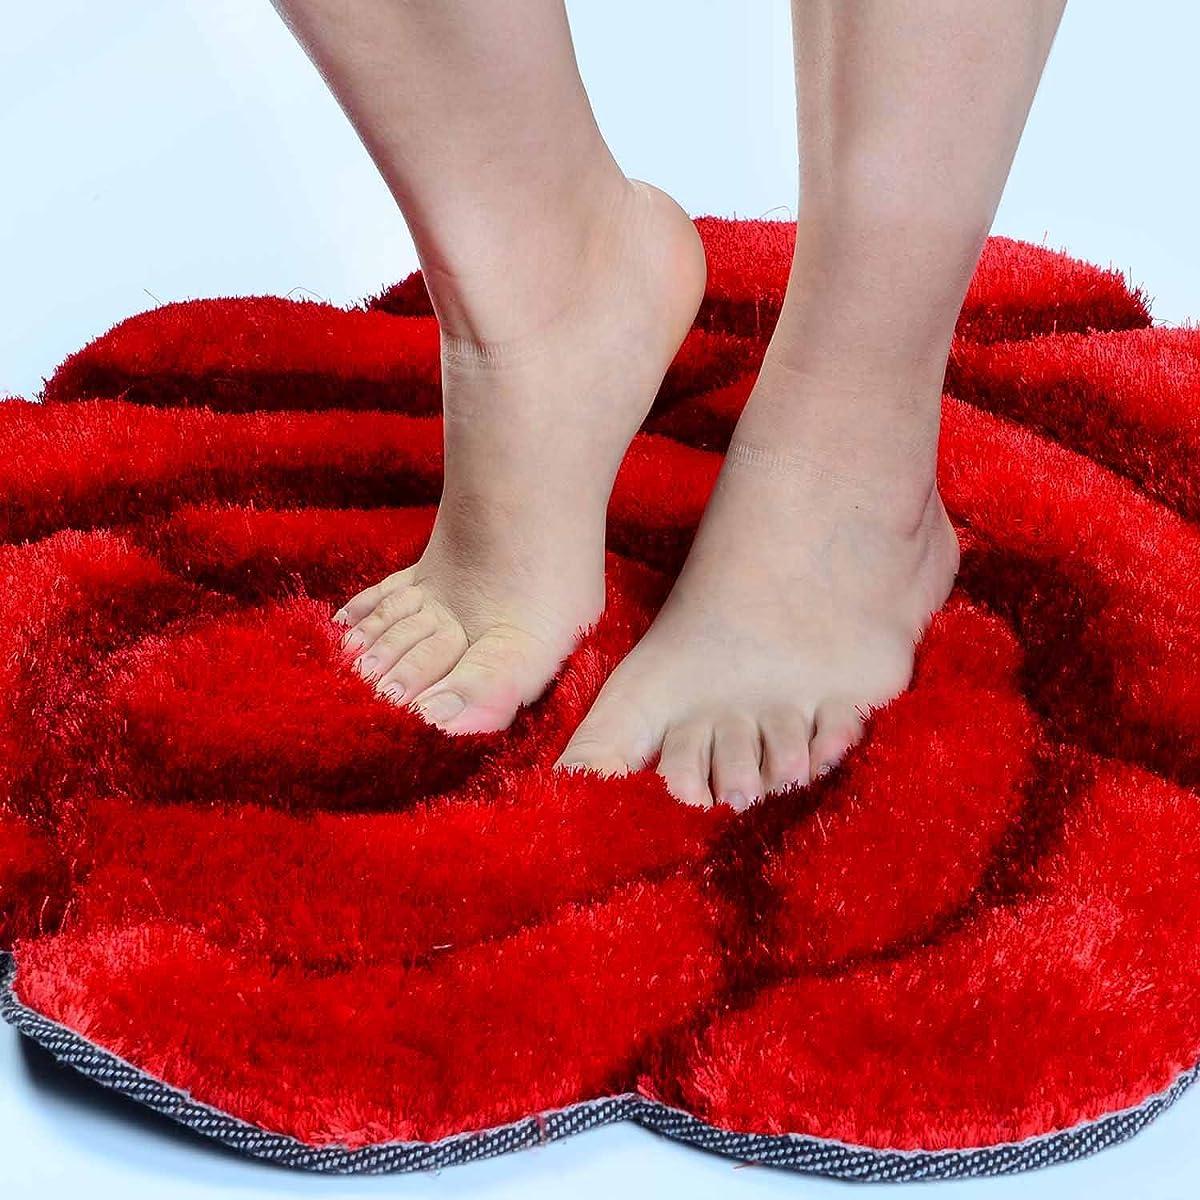 "Rose Design Rugs /Carpet,Flower Shape Shaggy Bedroom Area Rugs Modern Living Room Carpet 3D Floral Rug Soft Shaggy Area Rugs (27.6""/70cm 27.6""70cm) (RED)"